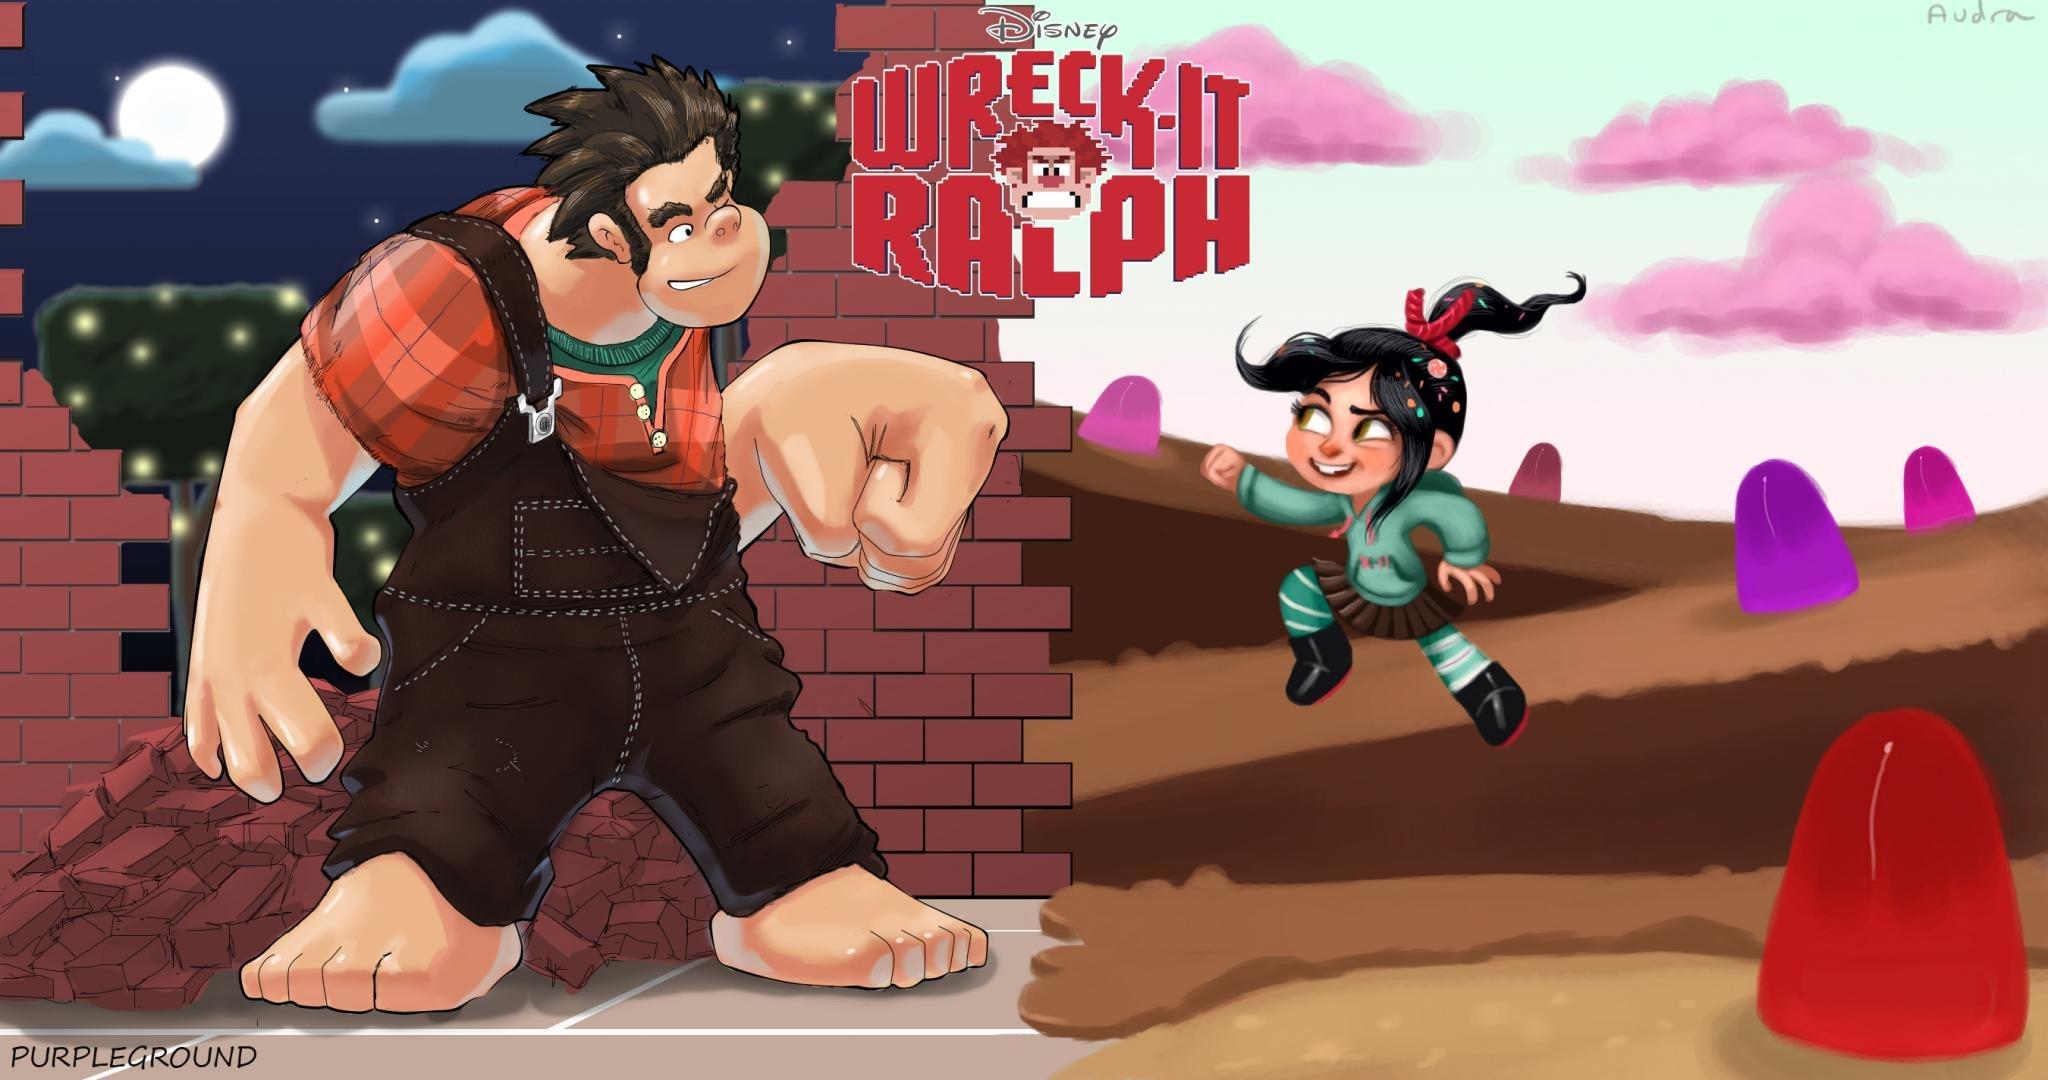 Wreck It Ralph Animation Movie 4k Hd Desktop Wallpaper For: Vanellope Von Schweetz Wallpapers HD For Desktop Backgrounds